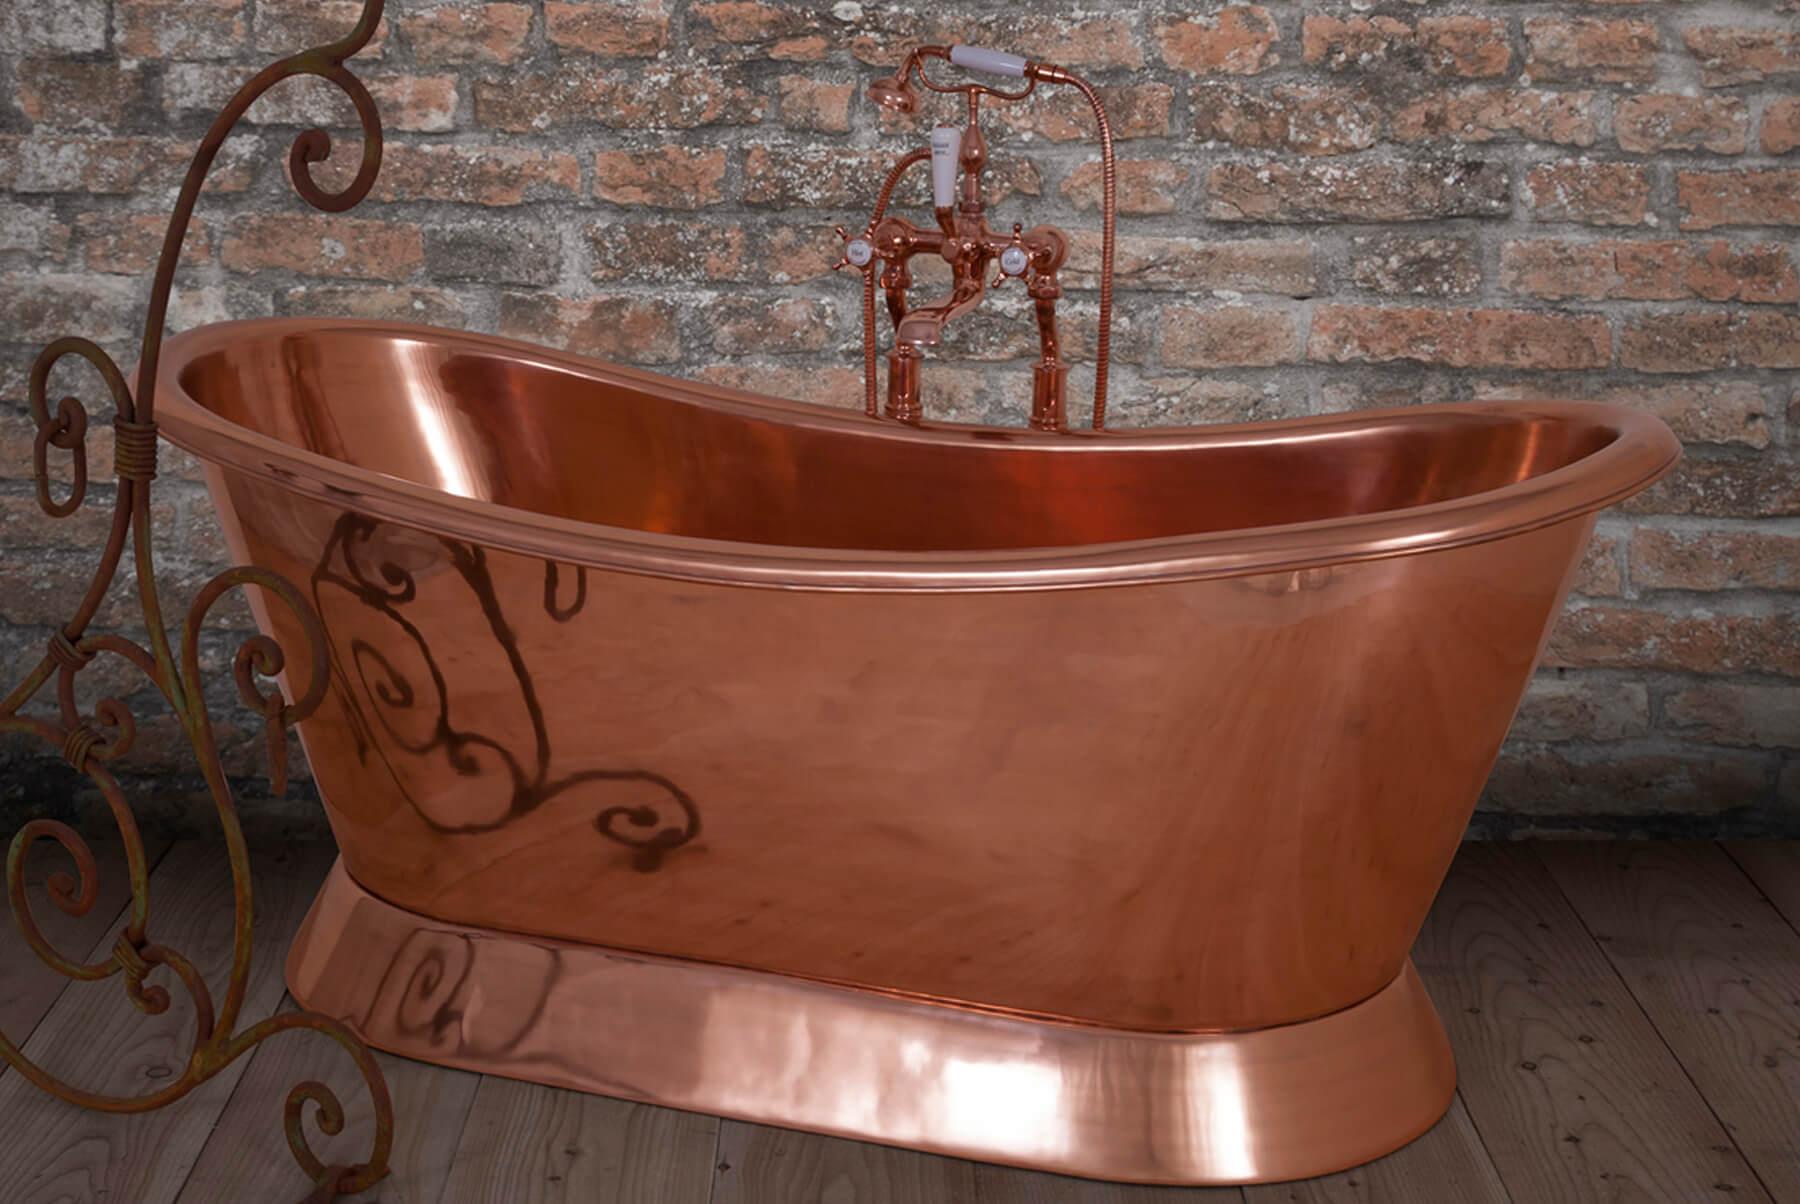 Bath-Tubs-Hurlingham-copper-bateau-copper-1800x1204